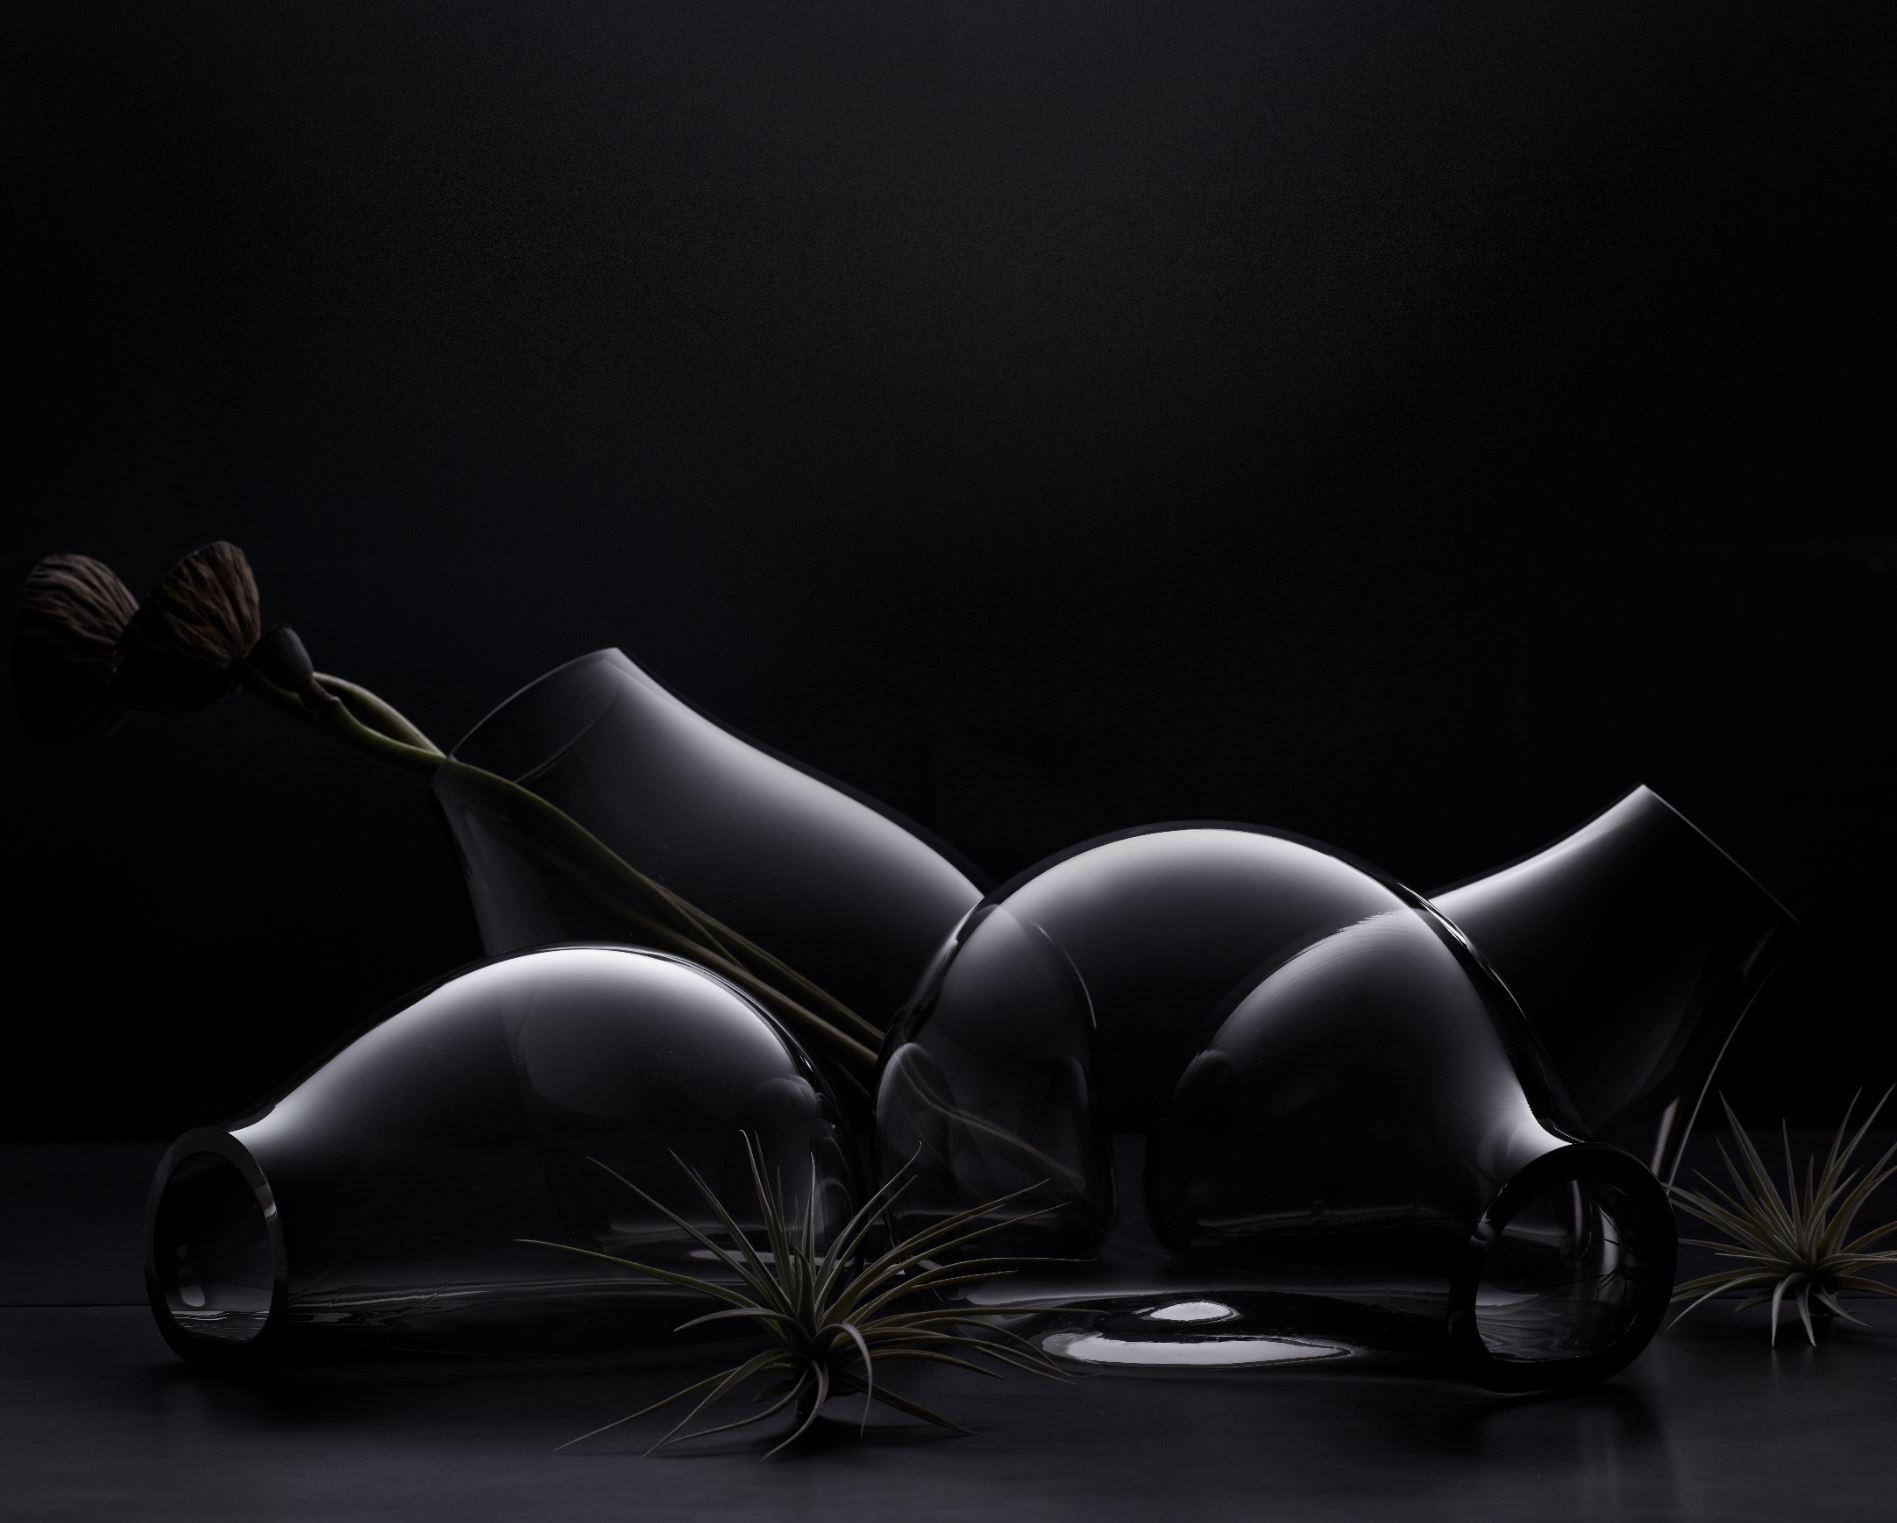 Issa's Konsepta glass Bubble Vases